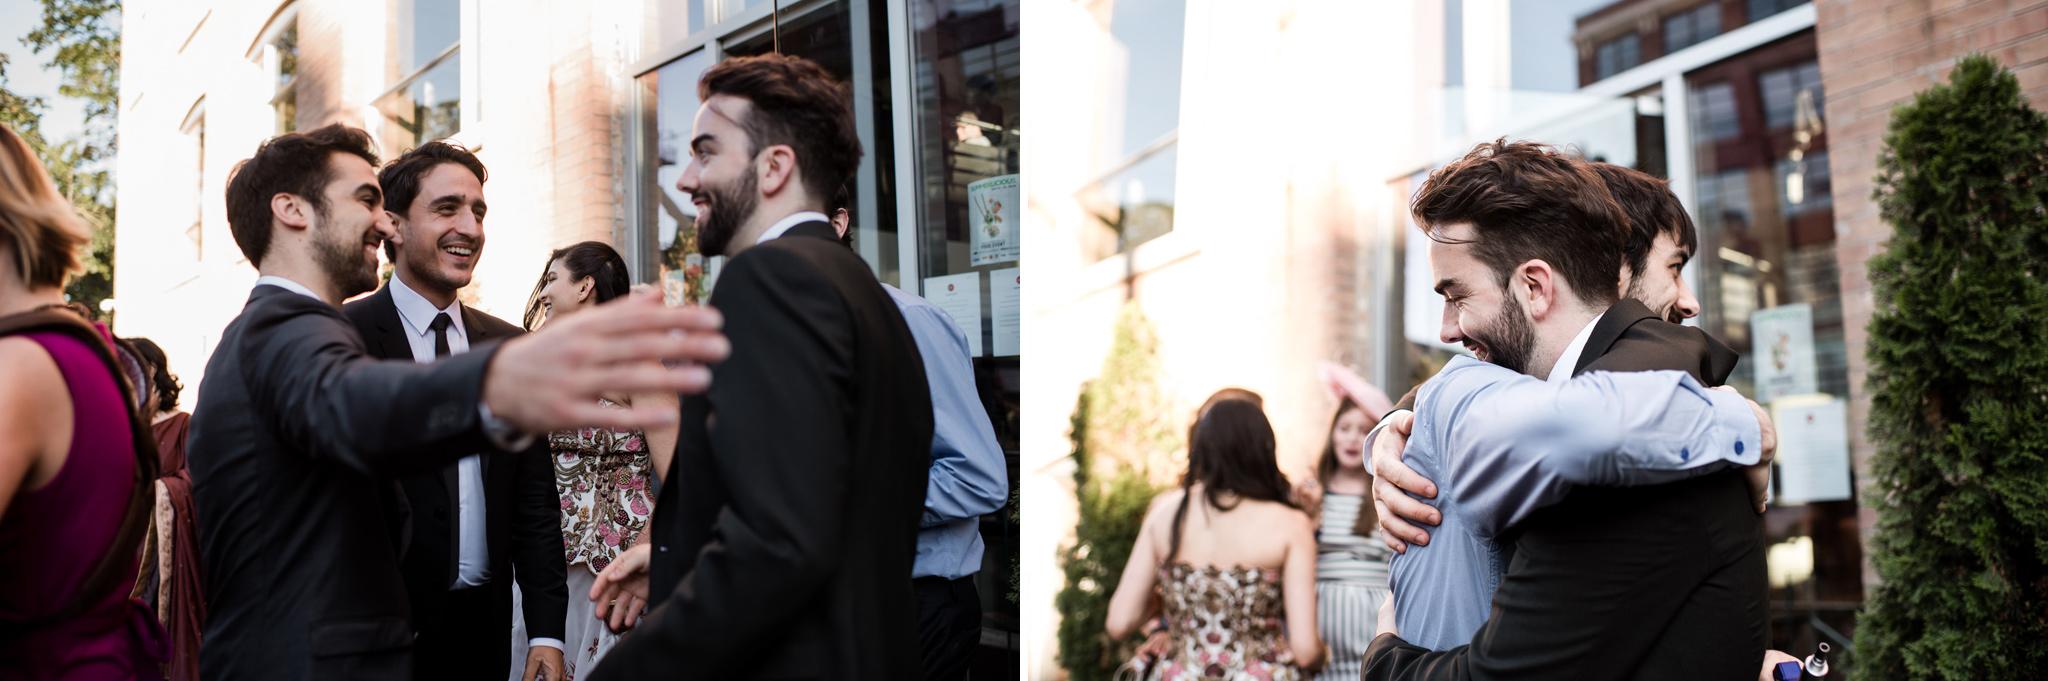 051-documentary-cocktail-reception-toronto-hotel-ocho-photography-wedding.jpg